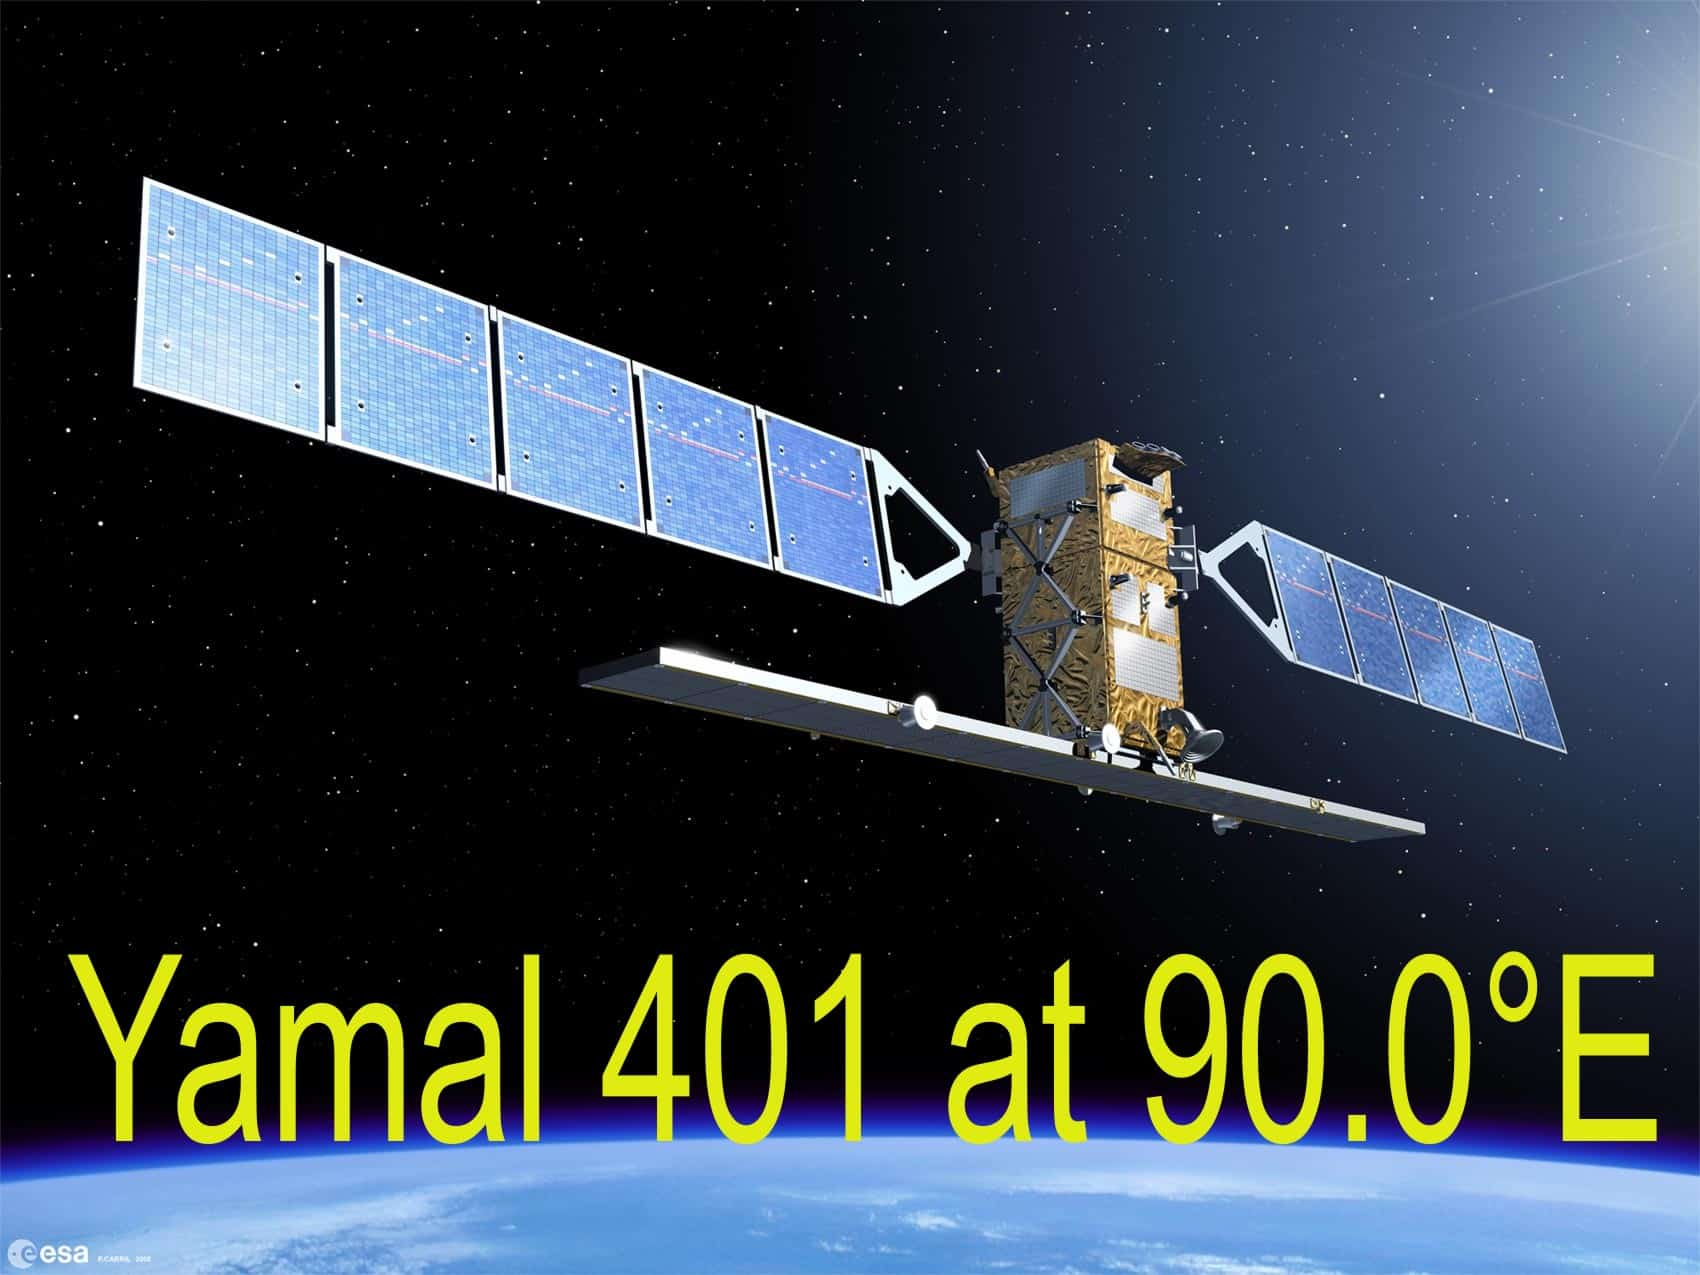 Yamal 401 at 90.0°E